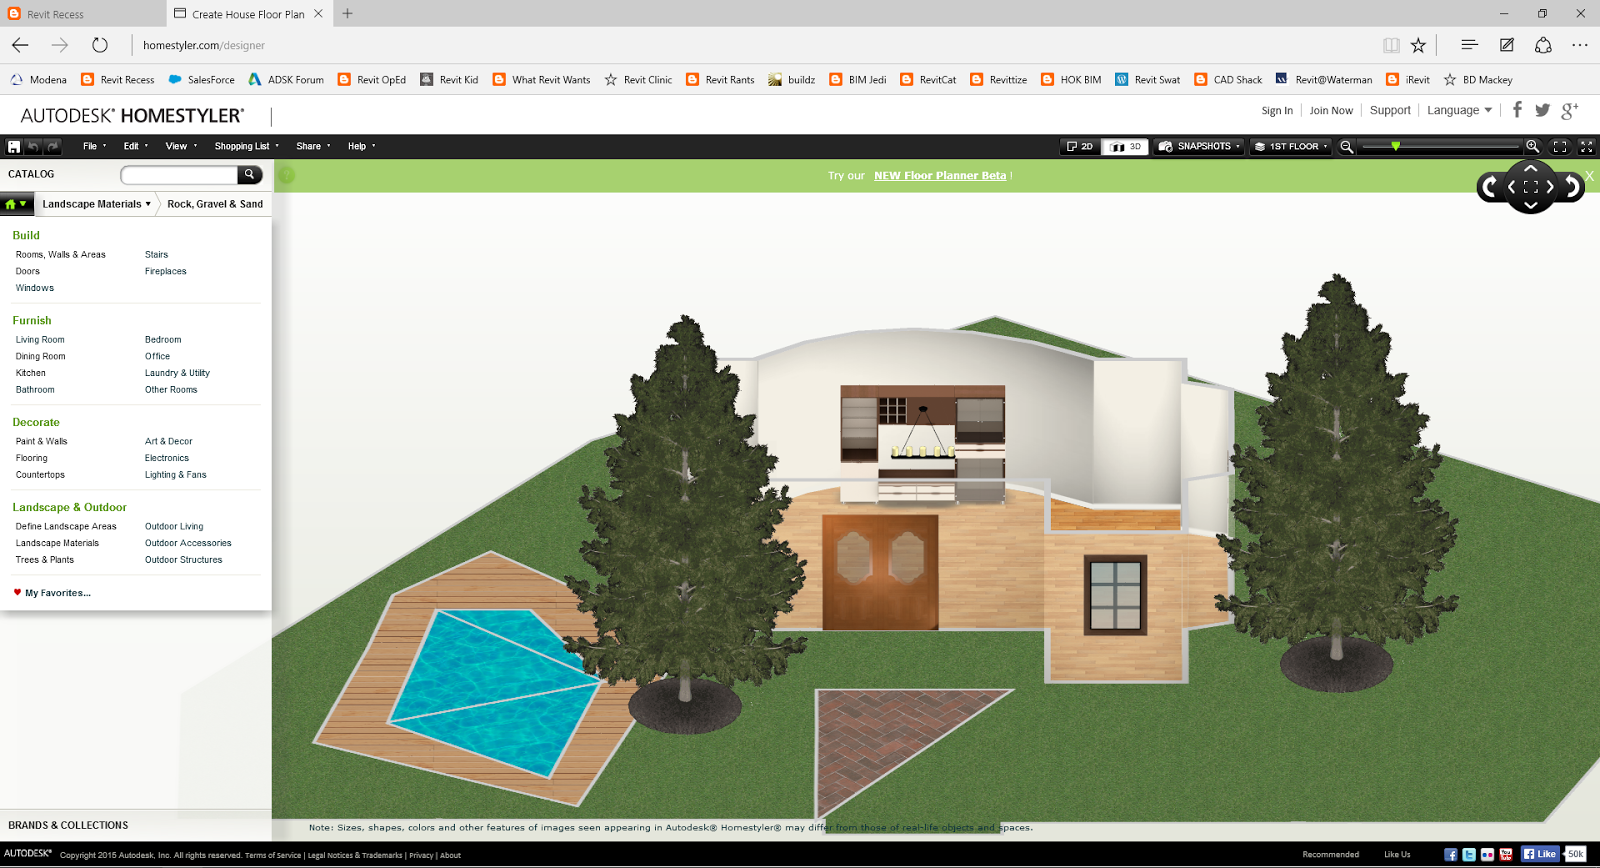 revit recess introduction to autodesk homestyler. Black Bedroom Furniture Sets. Home Design Ideas